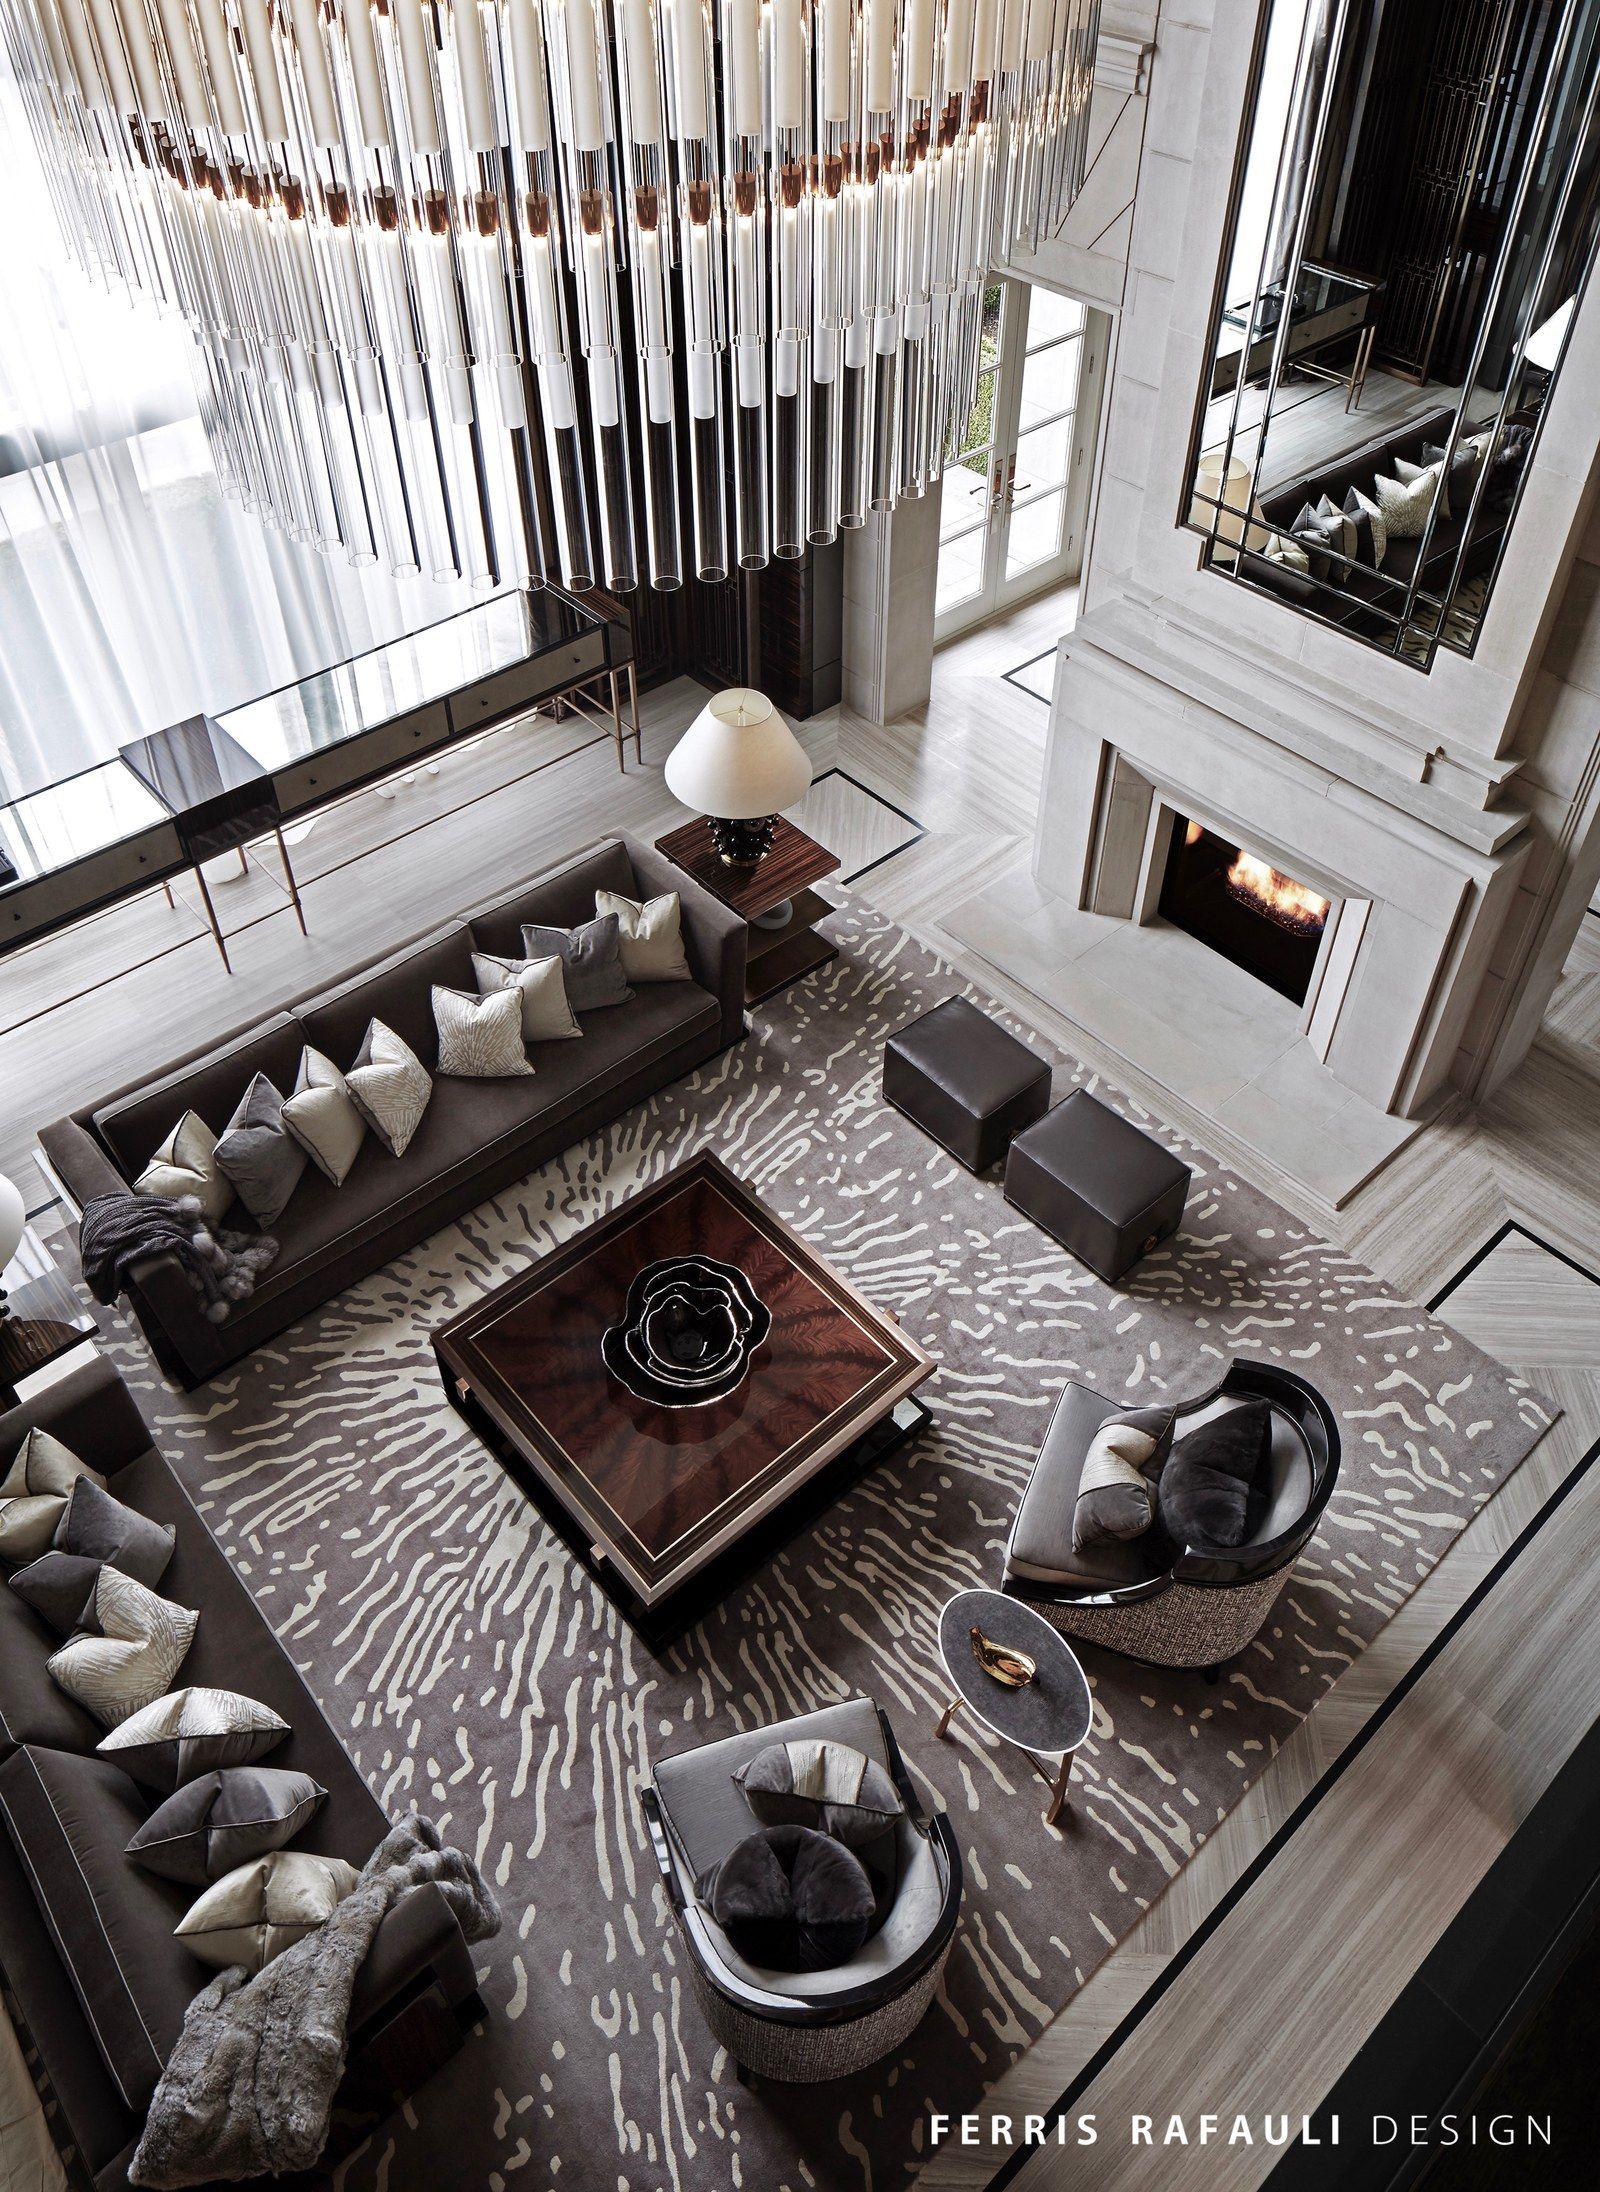 Captivating Ferris Rafauli | Architecture By Ferris Rafauli Get Started On Liberating  Your Interior Design At Decoraid Www.decoraid.com Luxury Beauty    Http://amzn.to/ ...